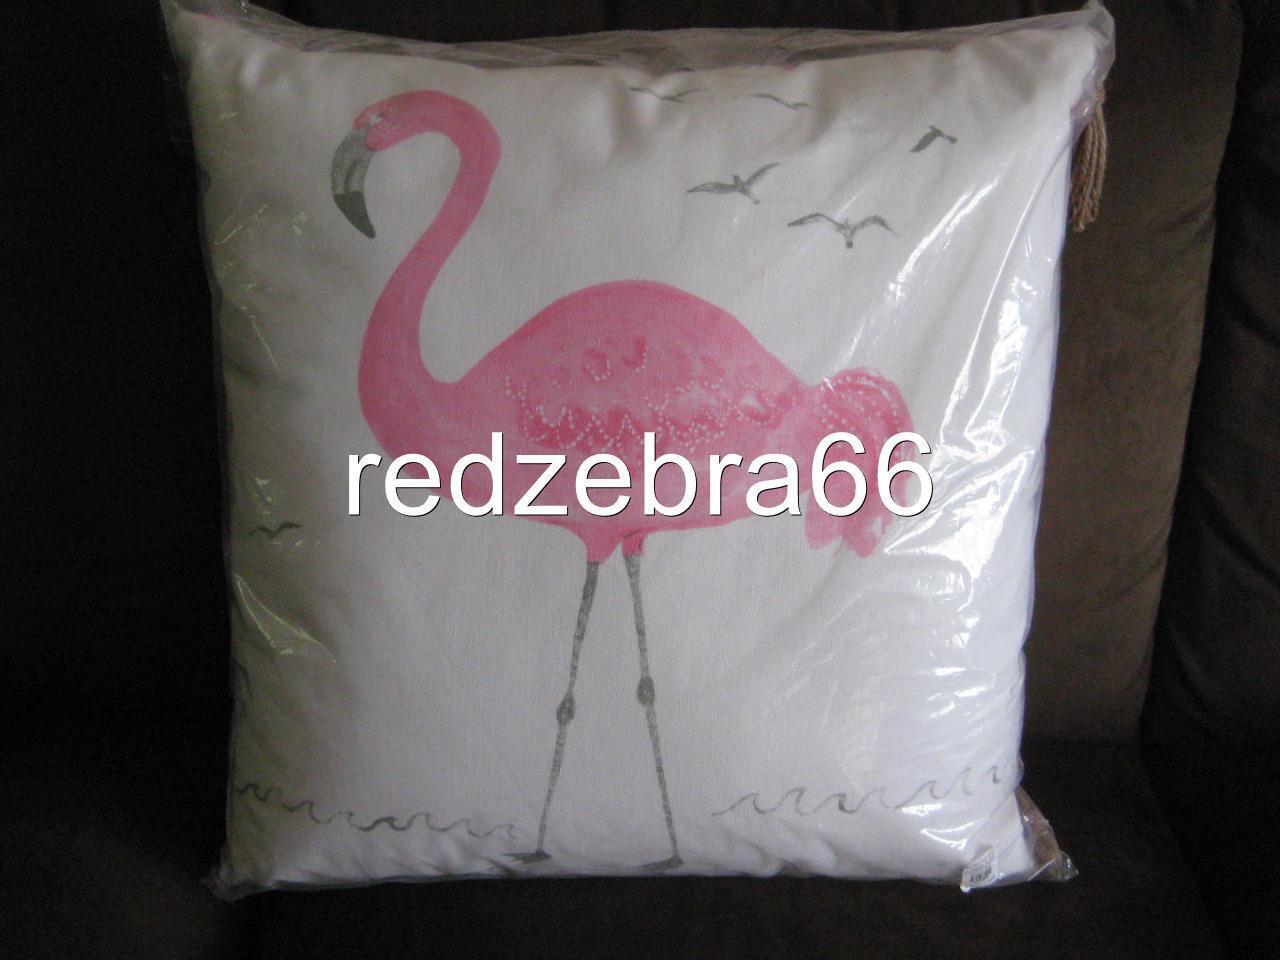 Pottery Barn Kids rose WaterCouleur Flamingo Decorative Pillow 2-0  x 20  NWT